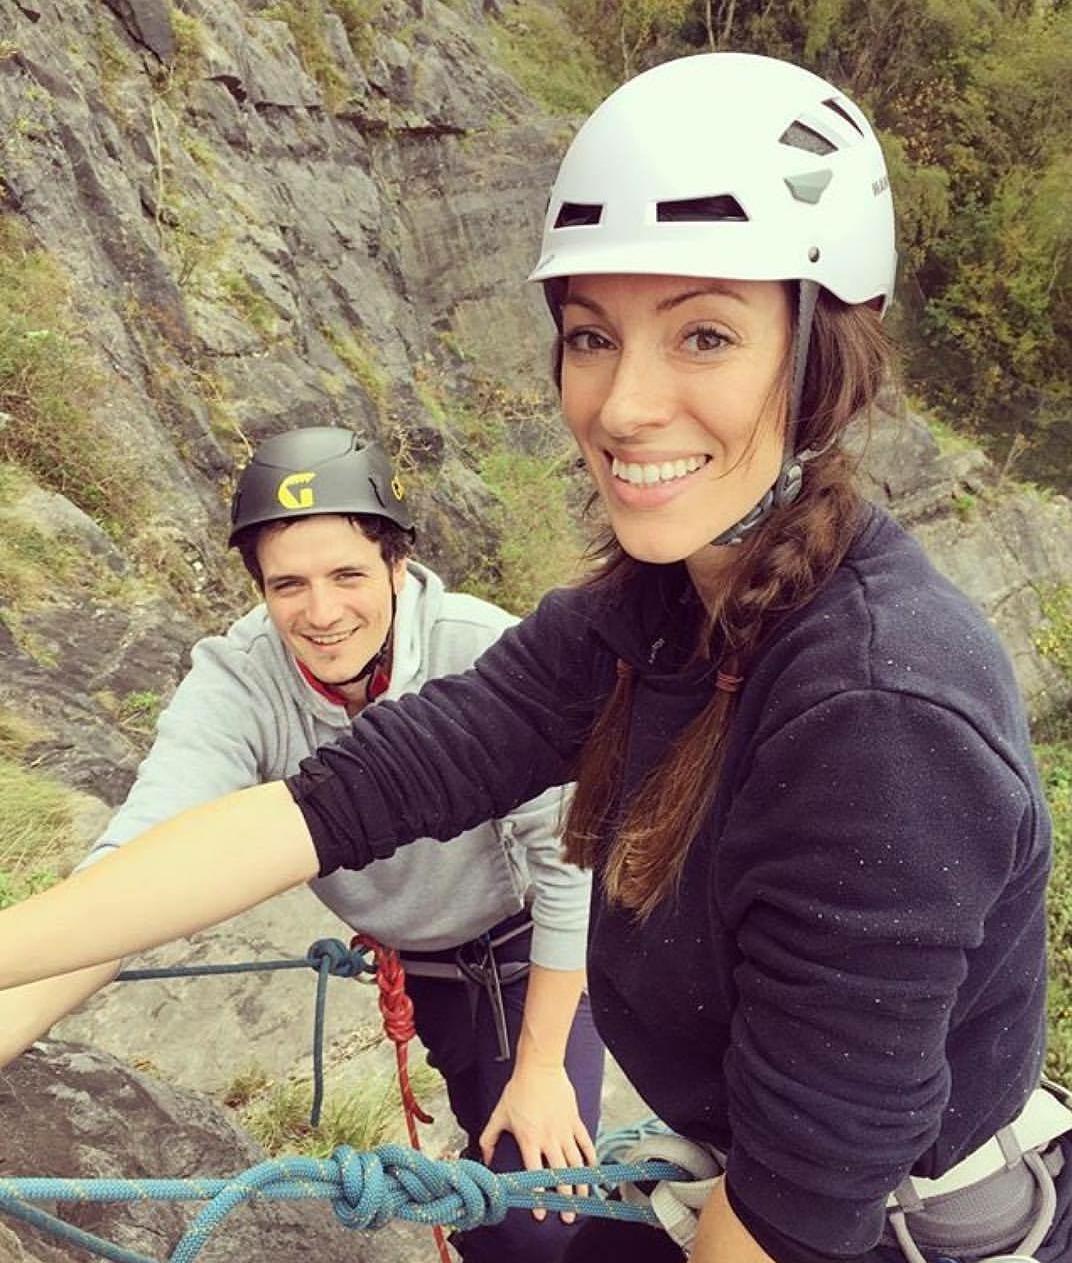 Climbing in the Avon Gorge, Bristol.